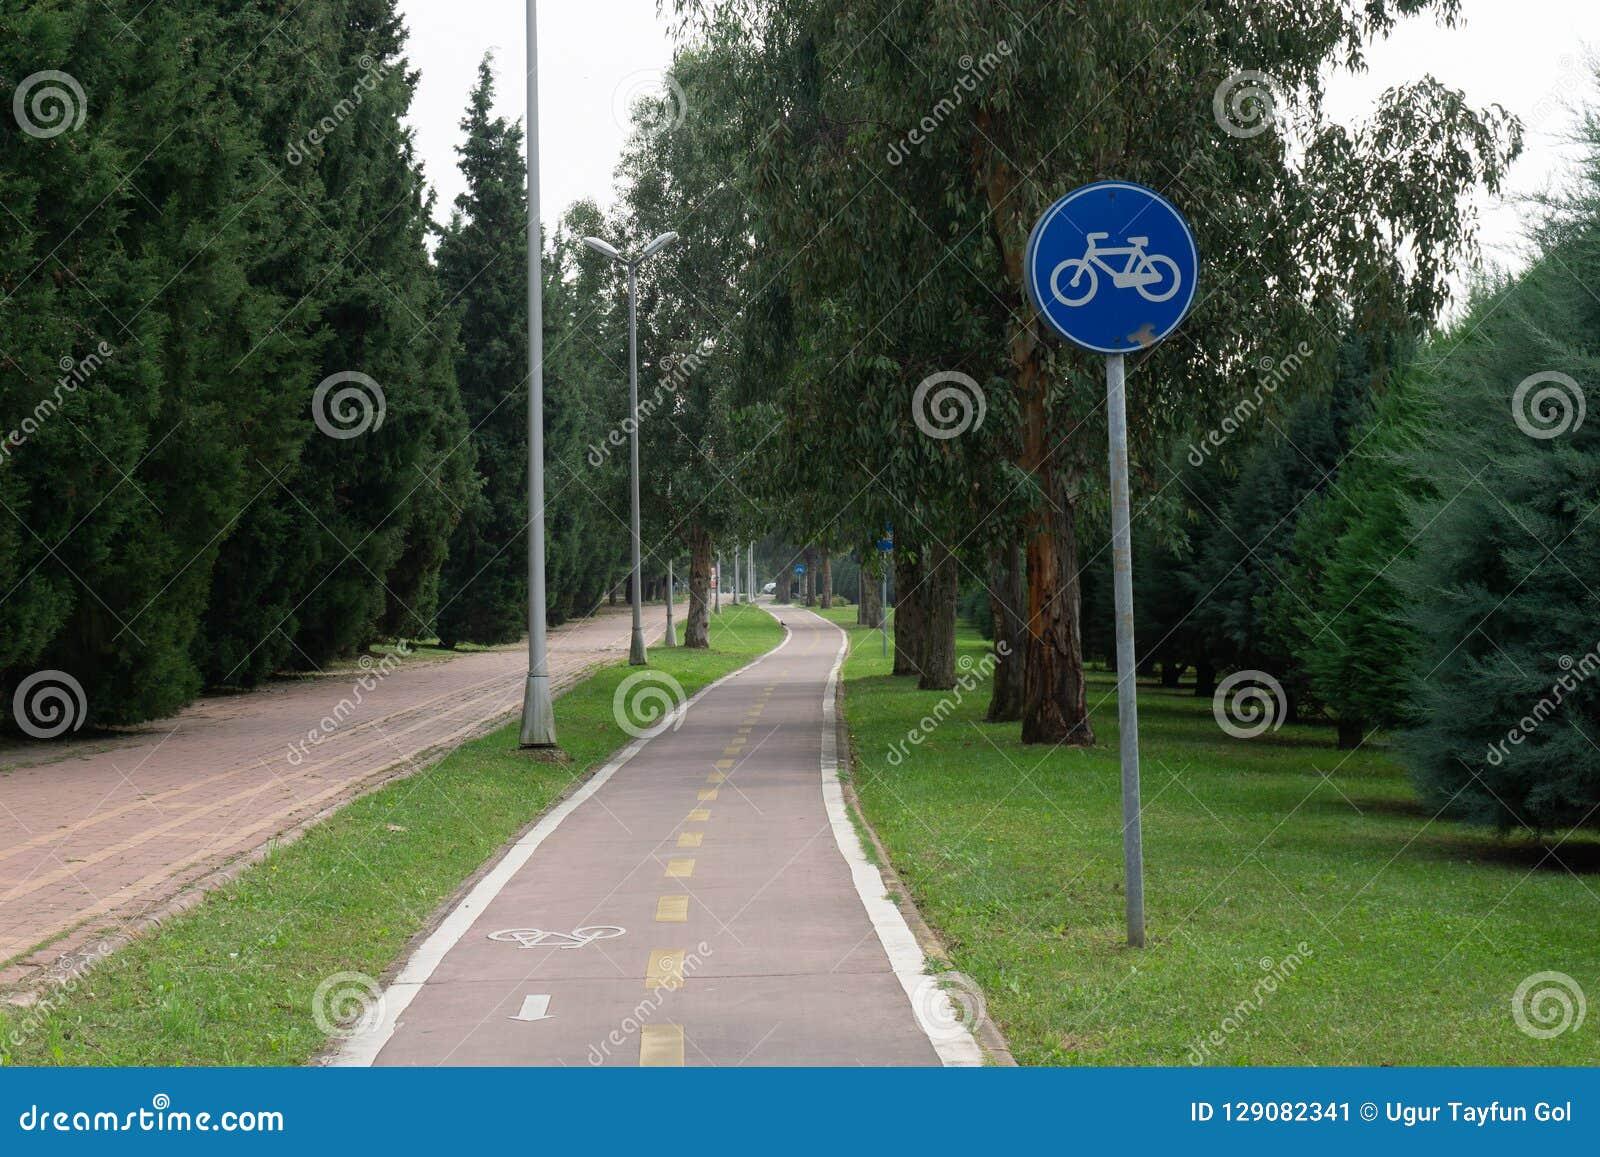 Cykelbana- och cykeltecken